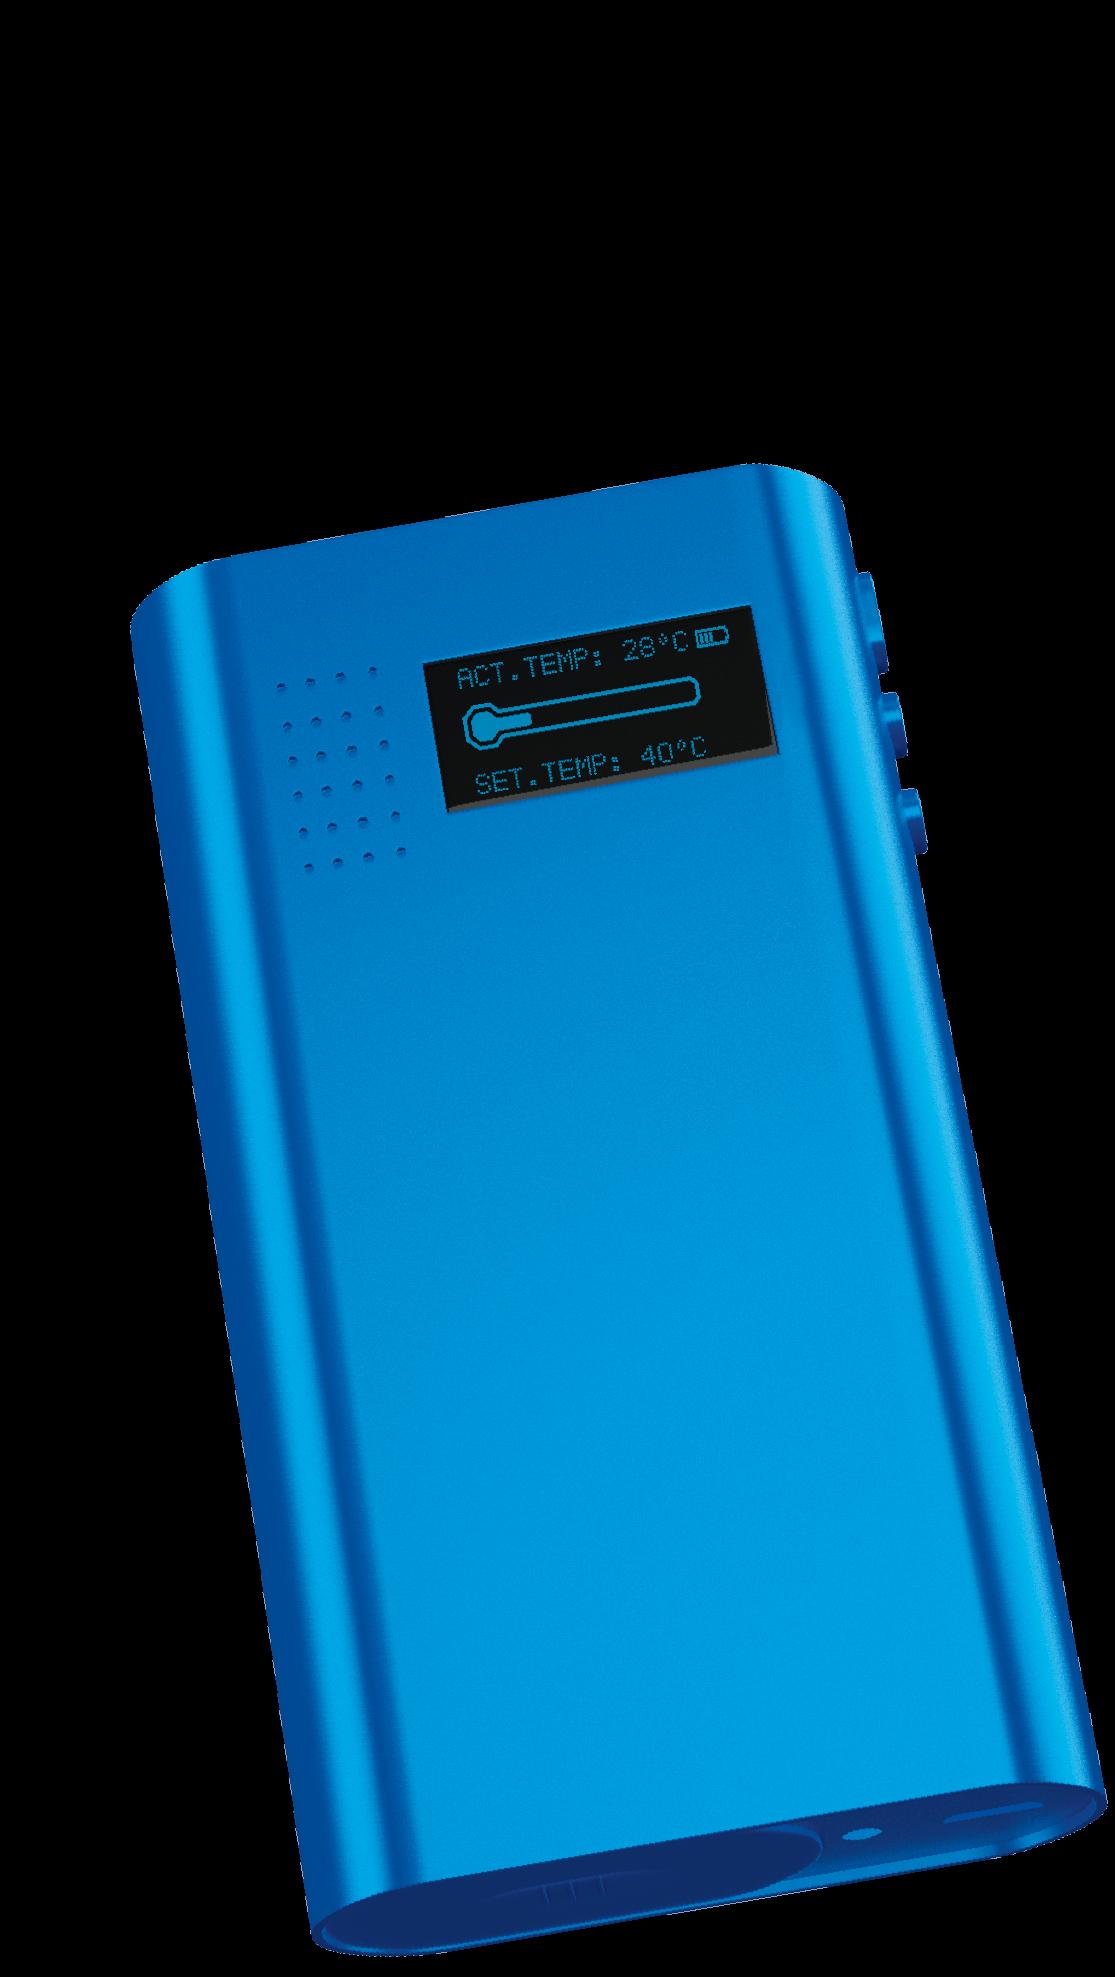 Flowermate portable vaporizer